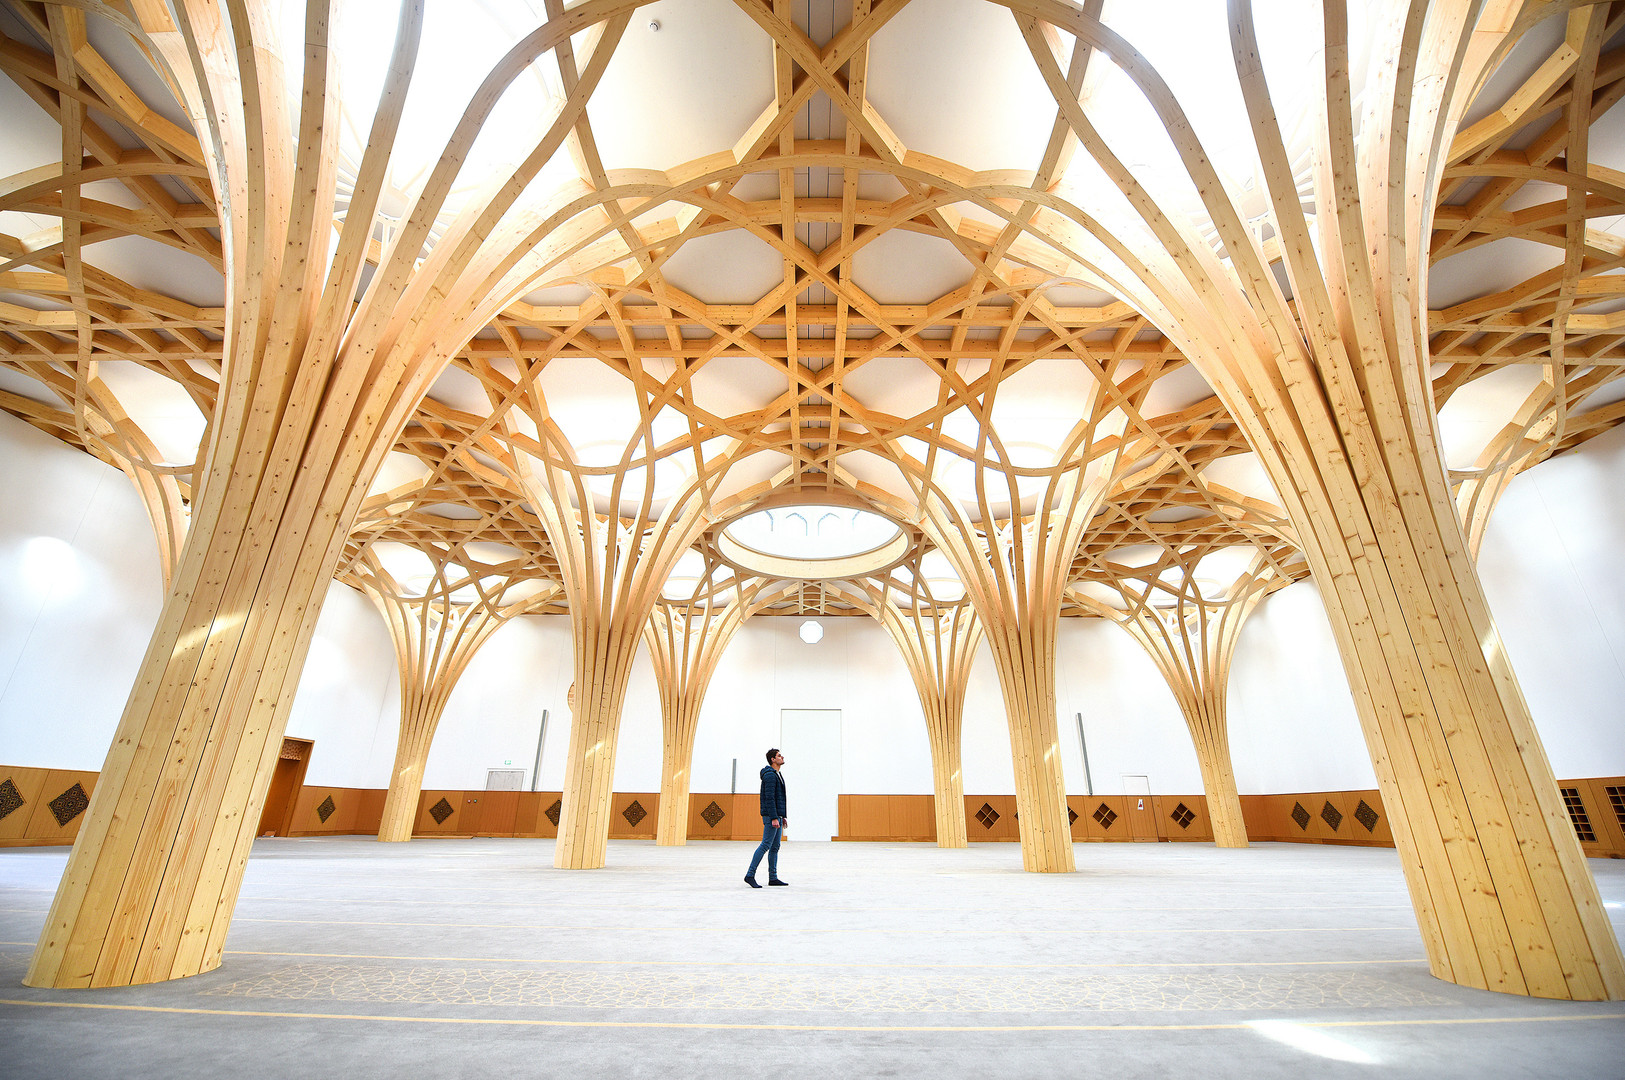 New mosque in Cambridge